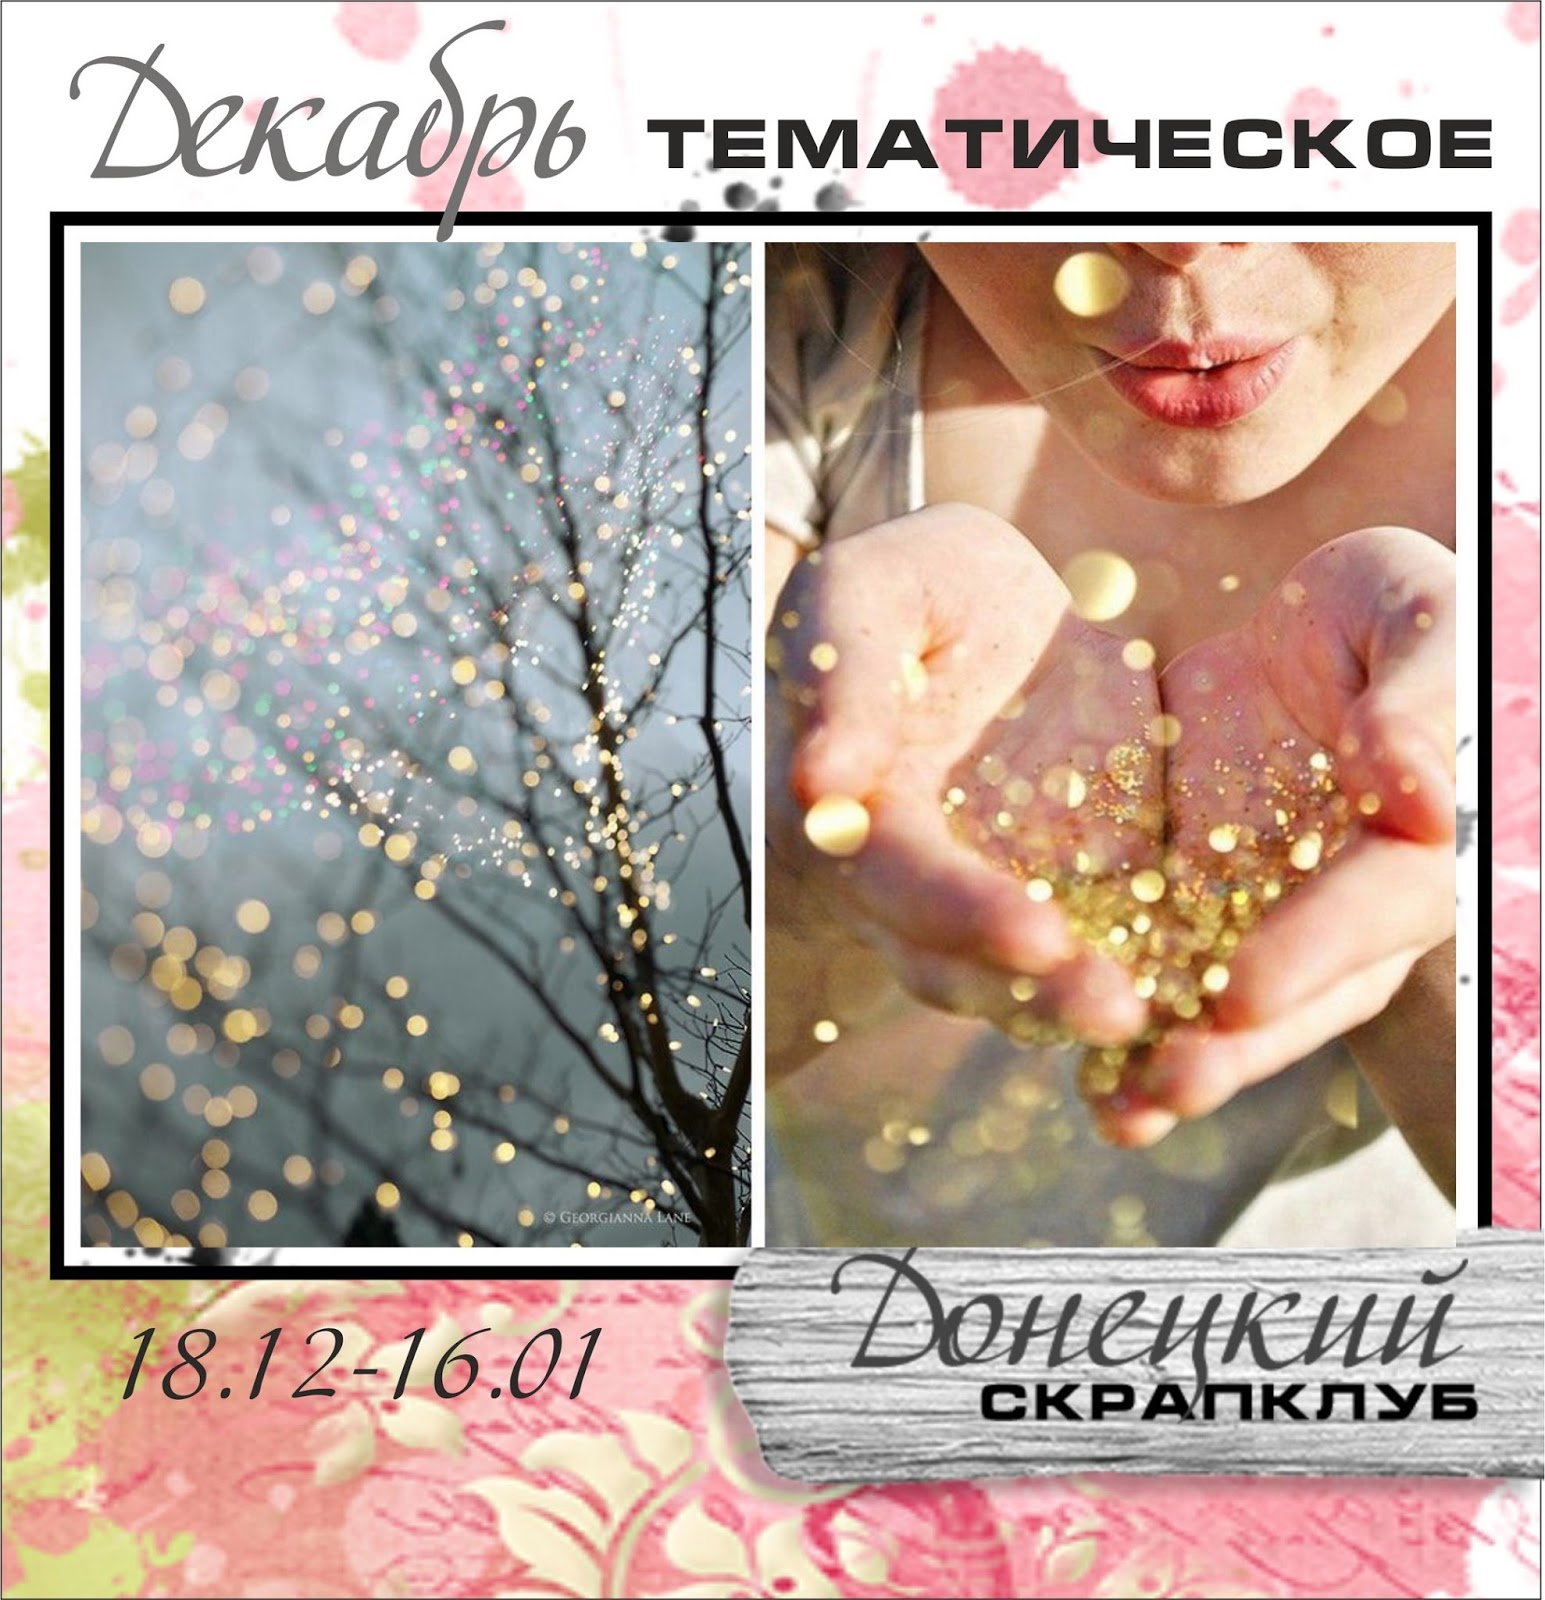 http://scrapclub-donetsk.blogspot.ru/2015/12/blog-post_23.html